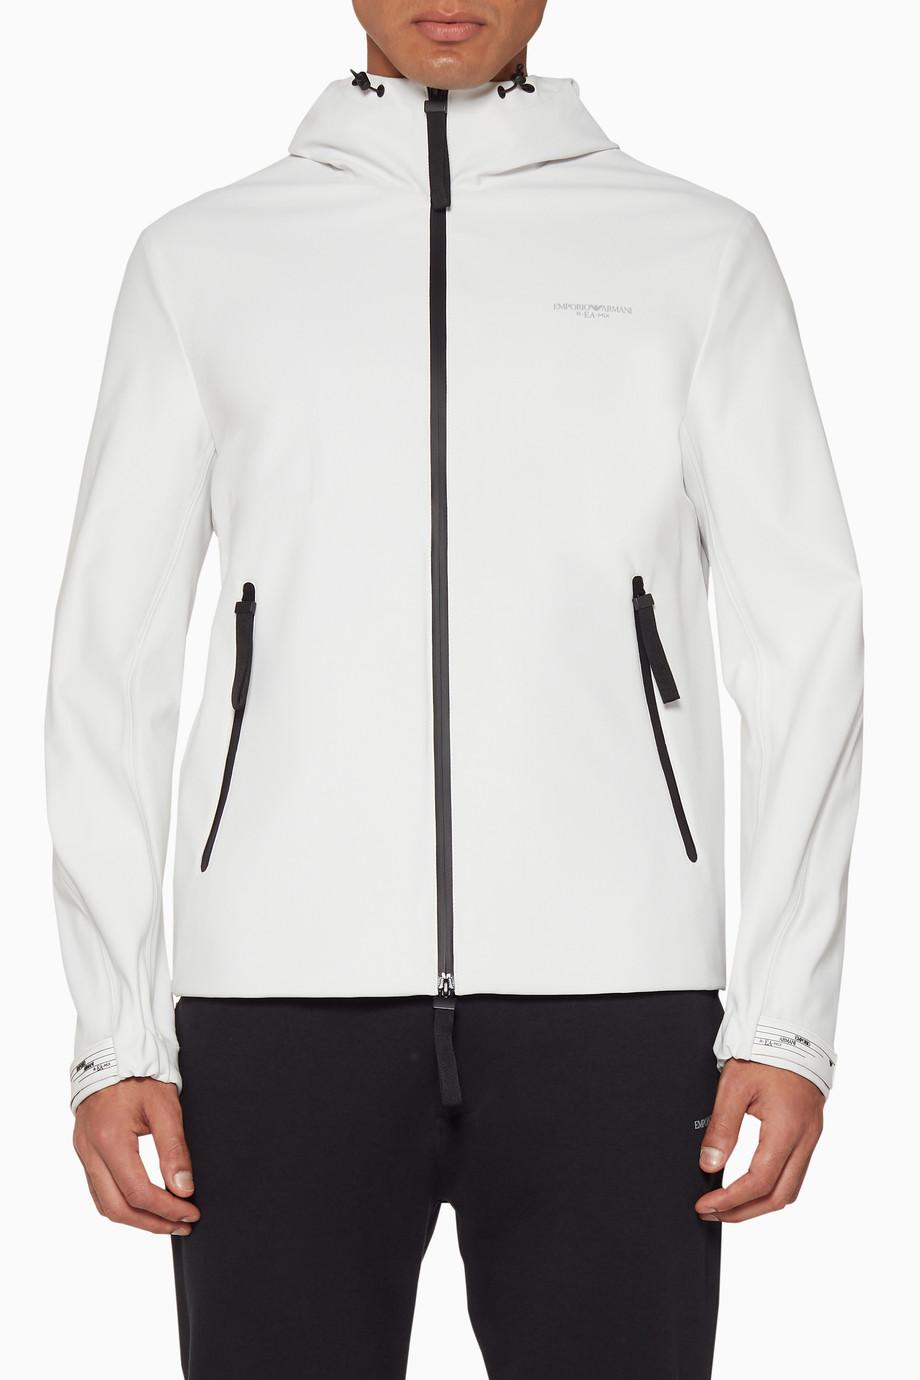 9d0162d4 Shop Emporio Armani Neutral Off-White Technical Logo Hoodie for Men ...